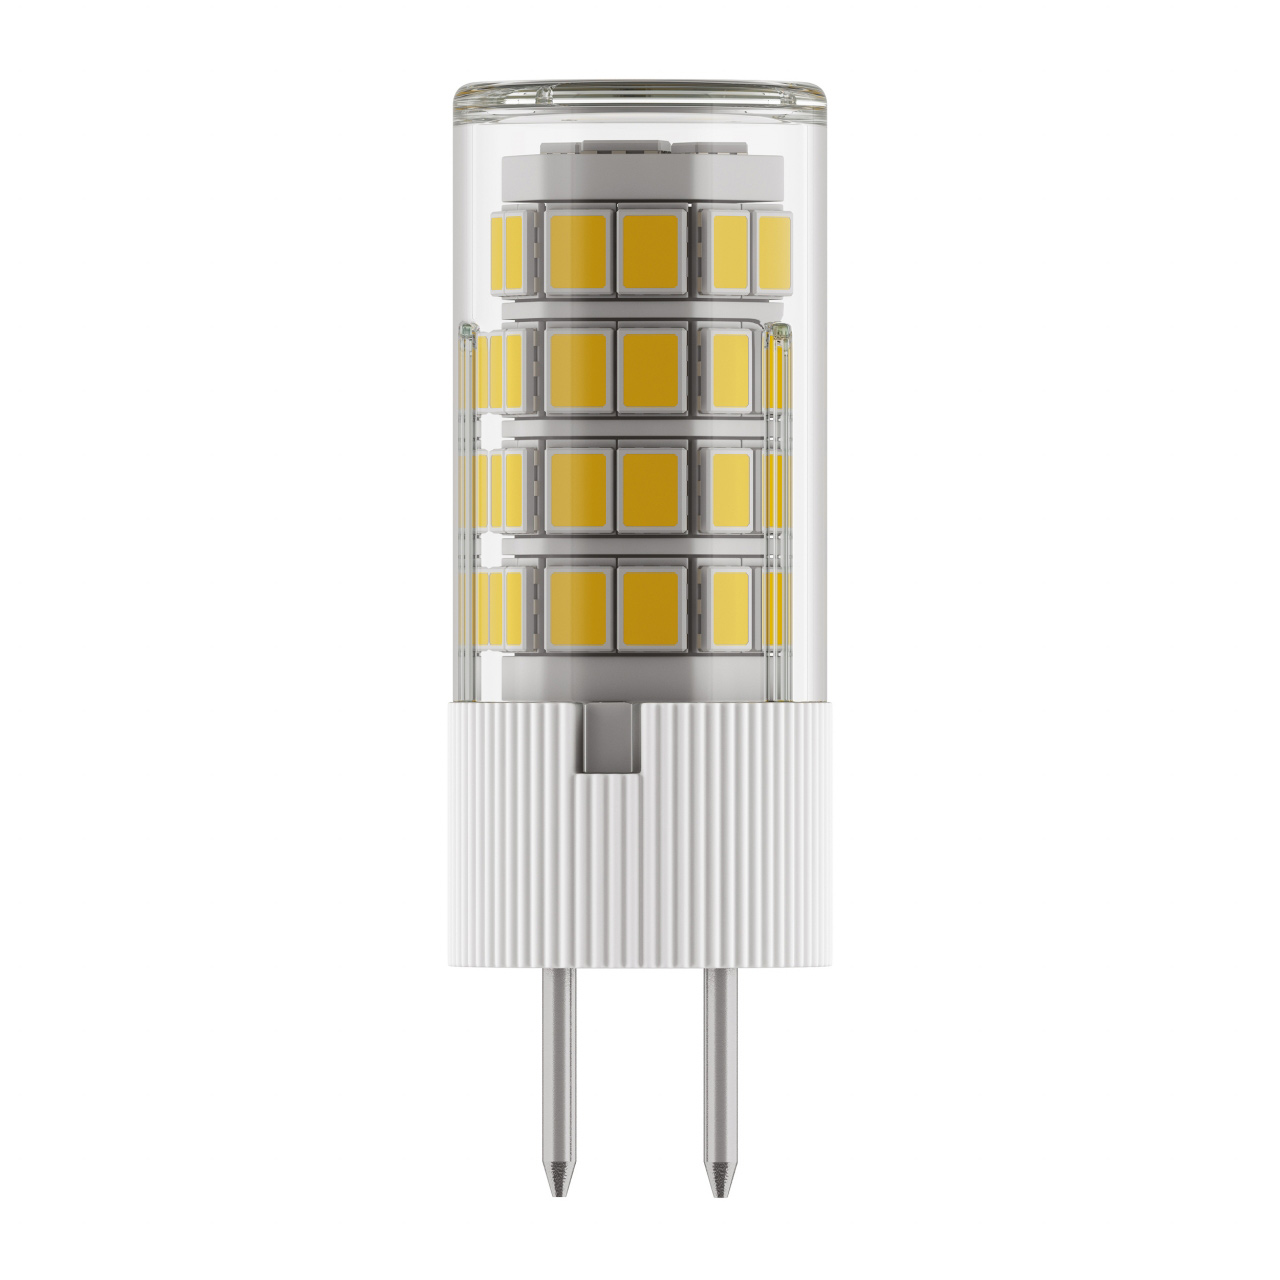 Лампа LED 220V Т20 G4 6W=60W 492LM 360G CL 4000K 20000H Lightstar 940414